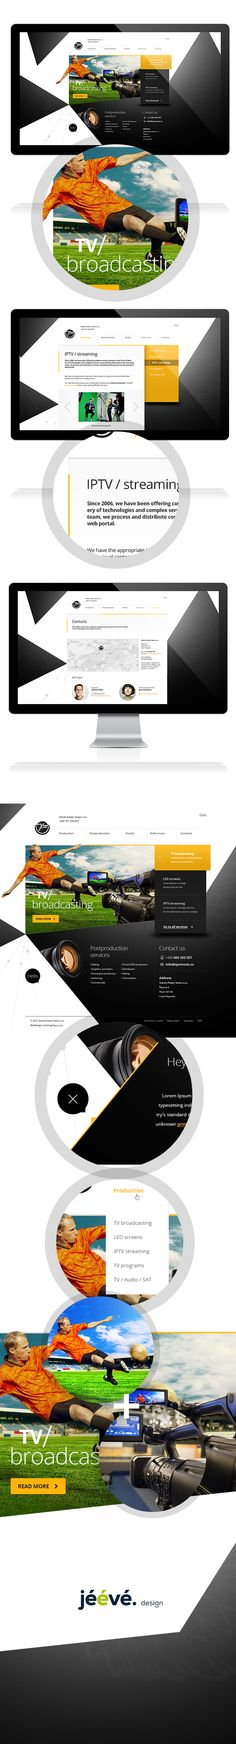 Sokols Power Voice by Jan Vašek. #website #webdesign